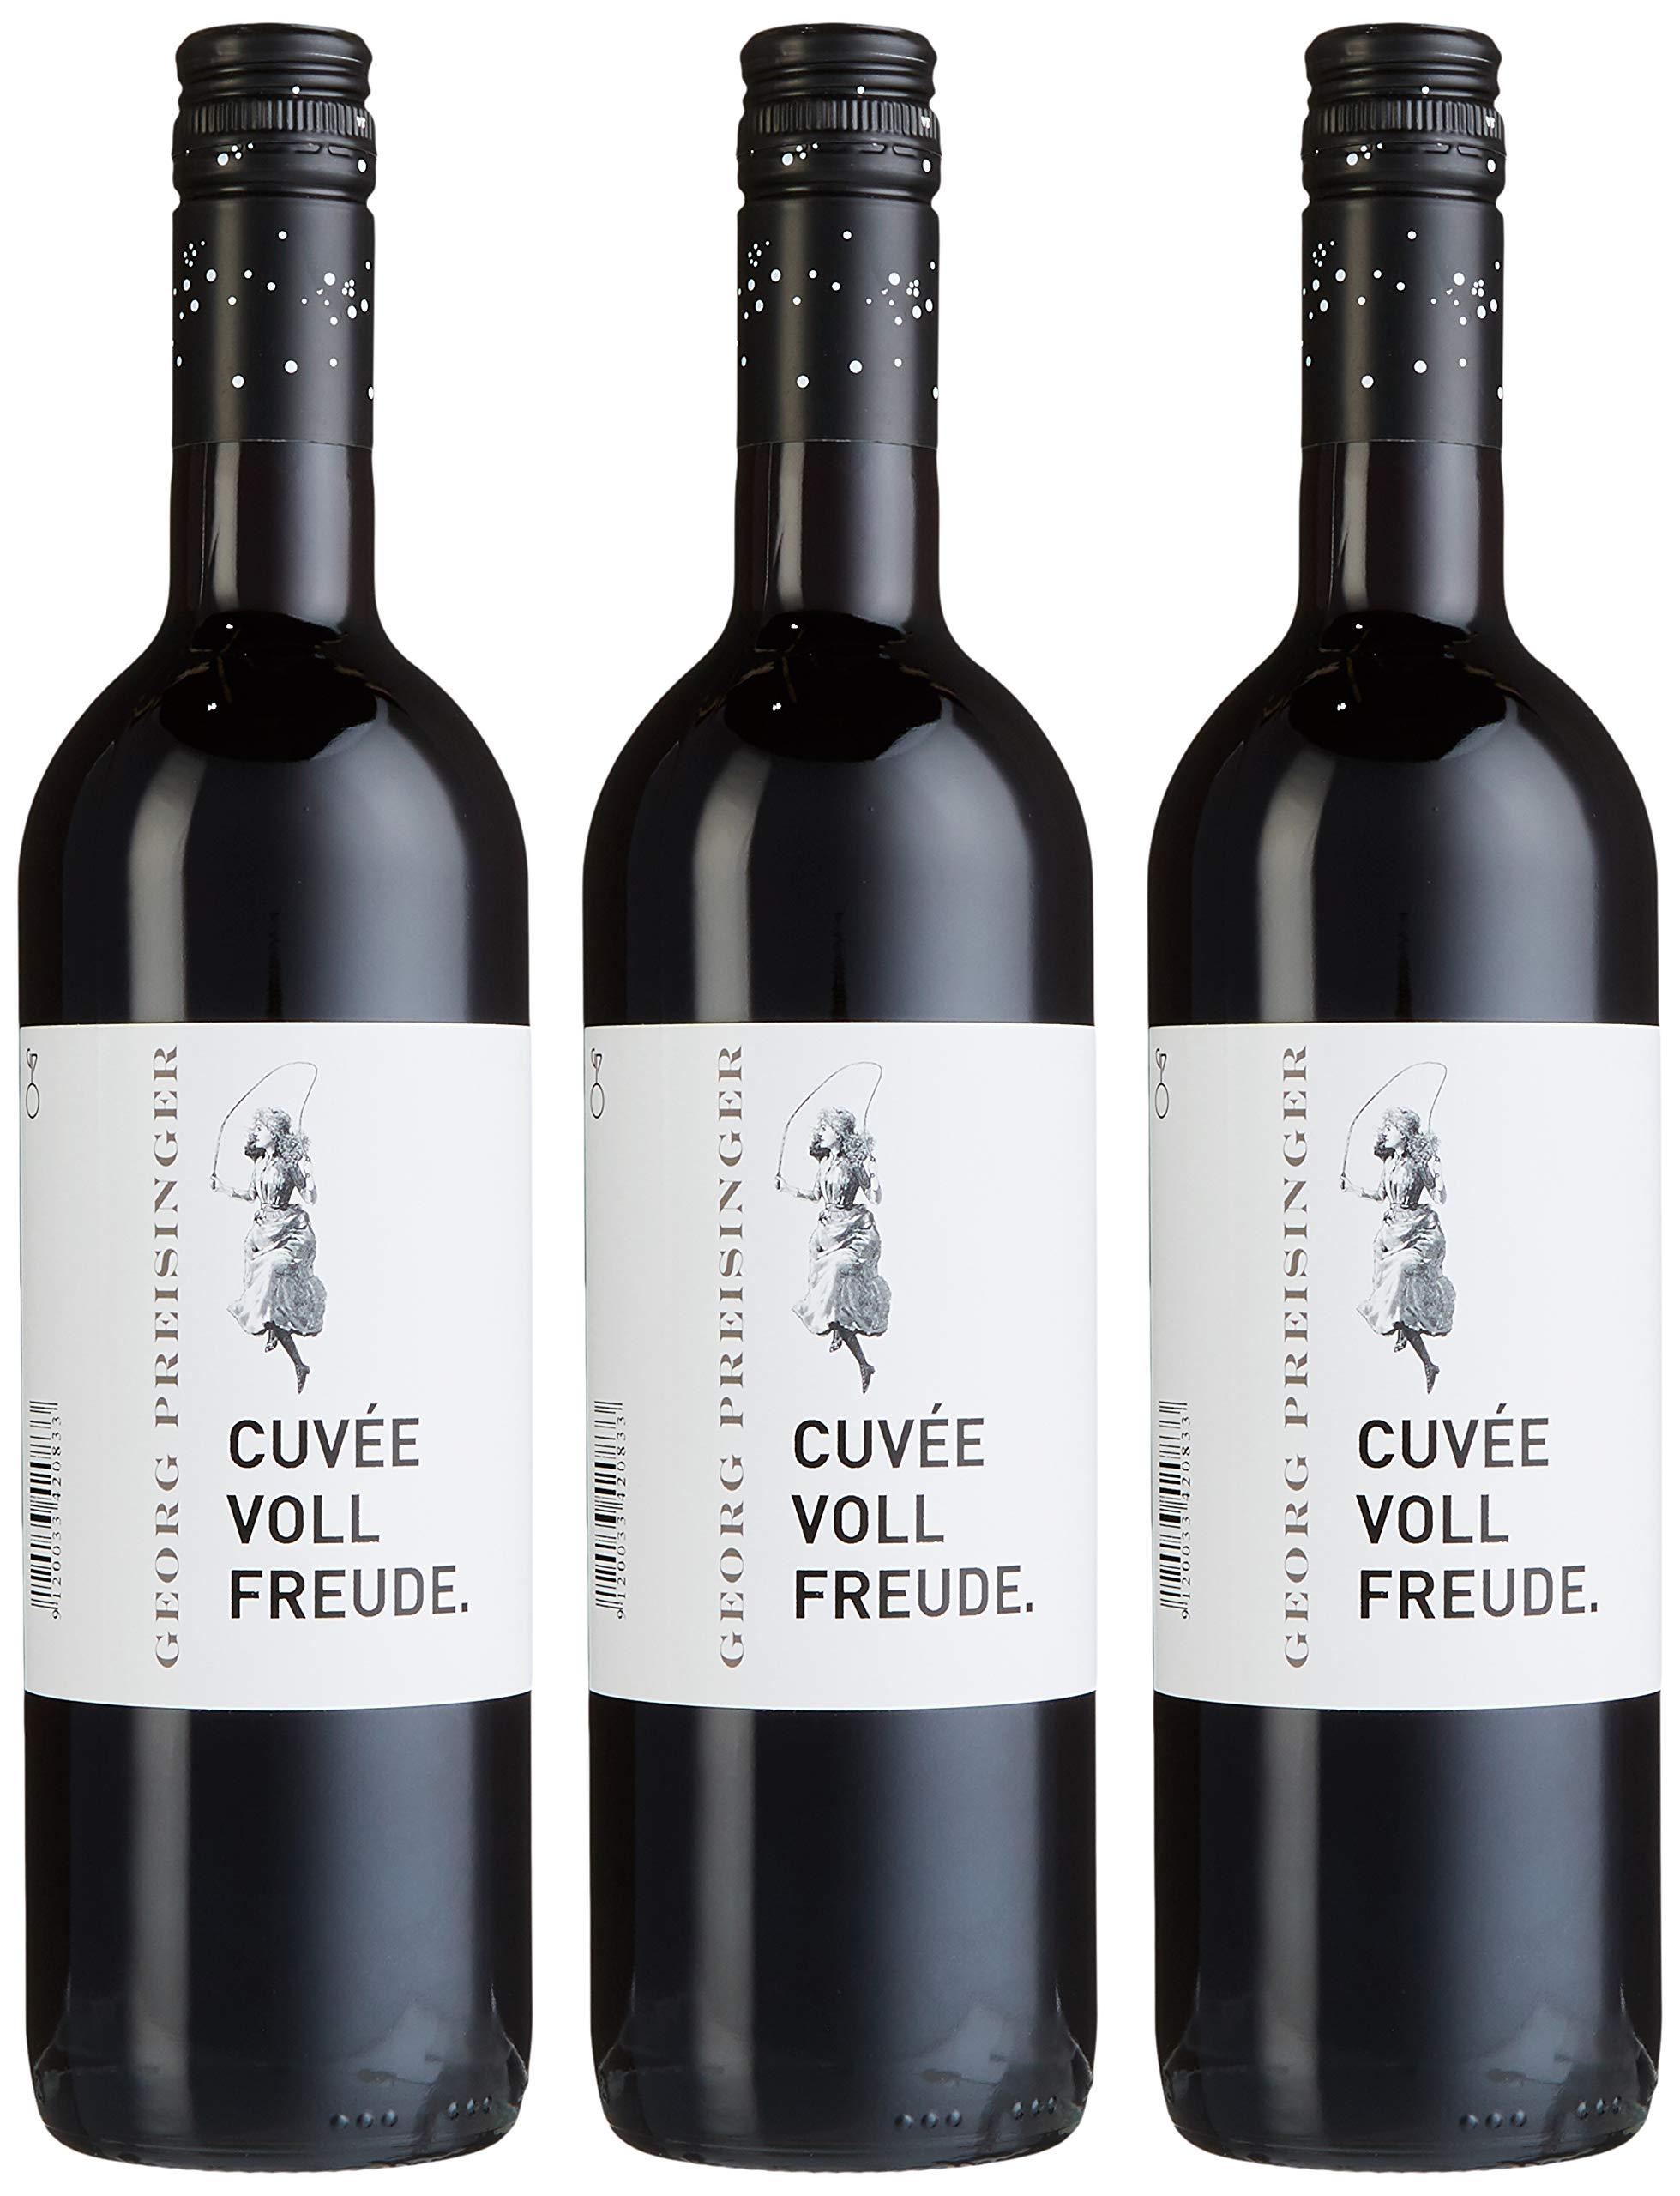 Weingut-Georg-Preisinger-Cuve-voll-Freude-Qualittswein-Trocken-3-x-075-l